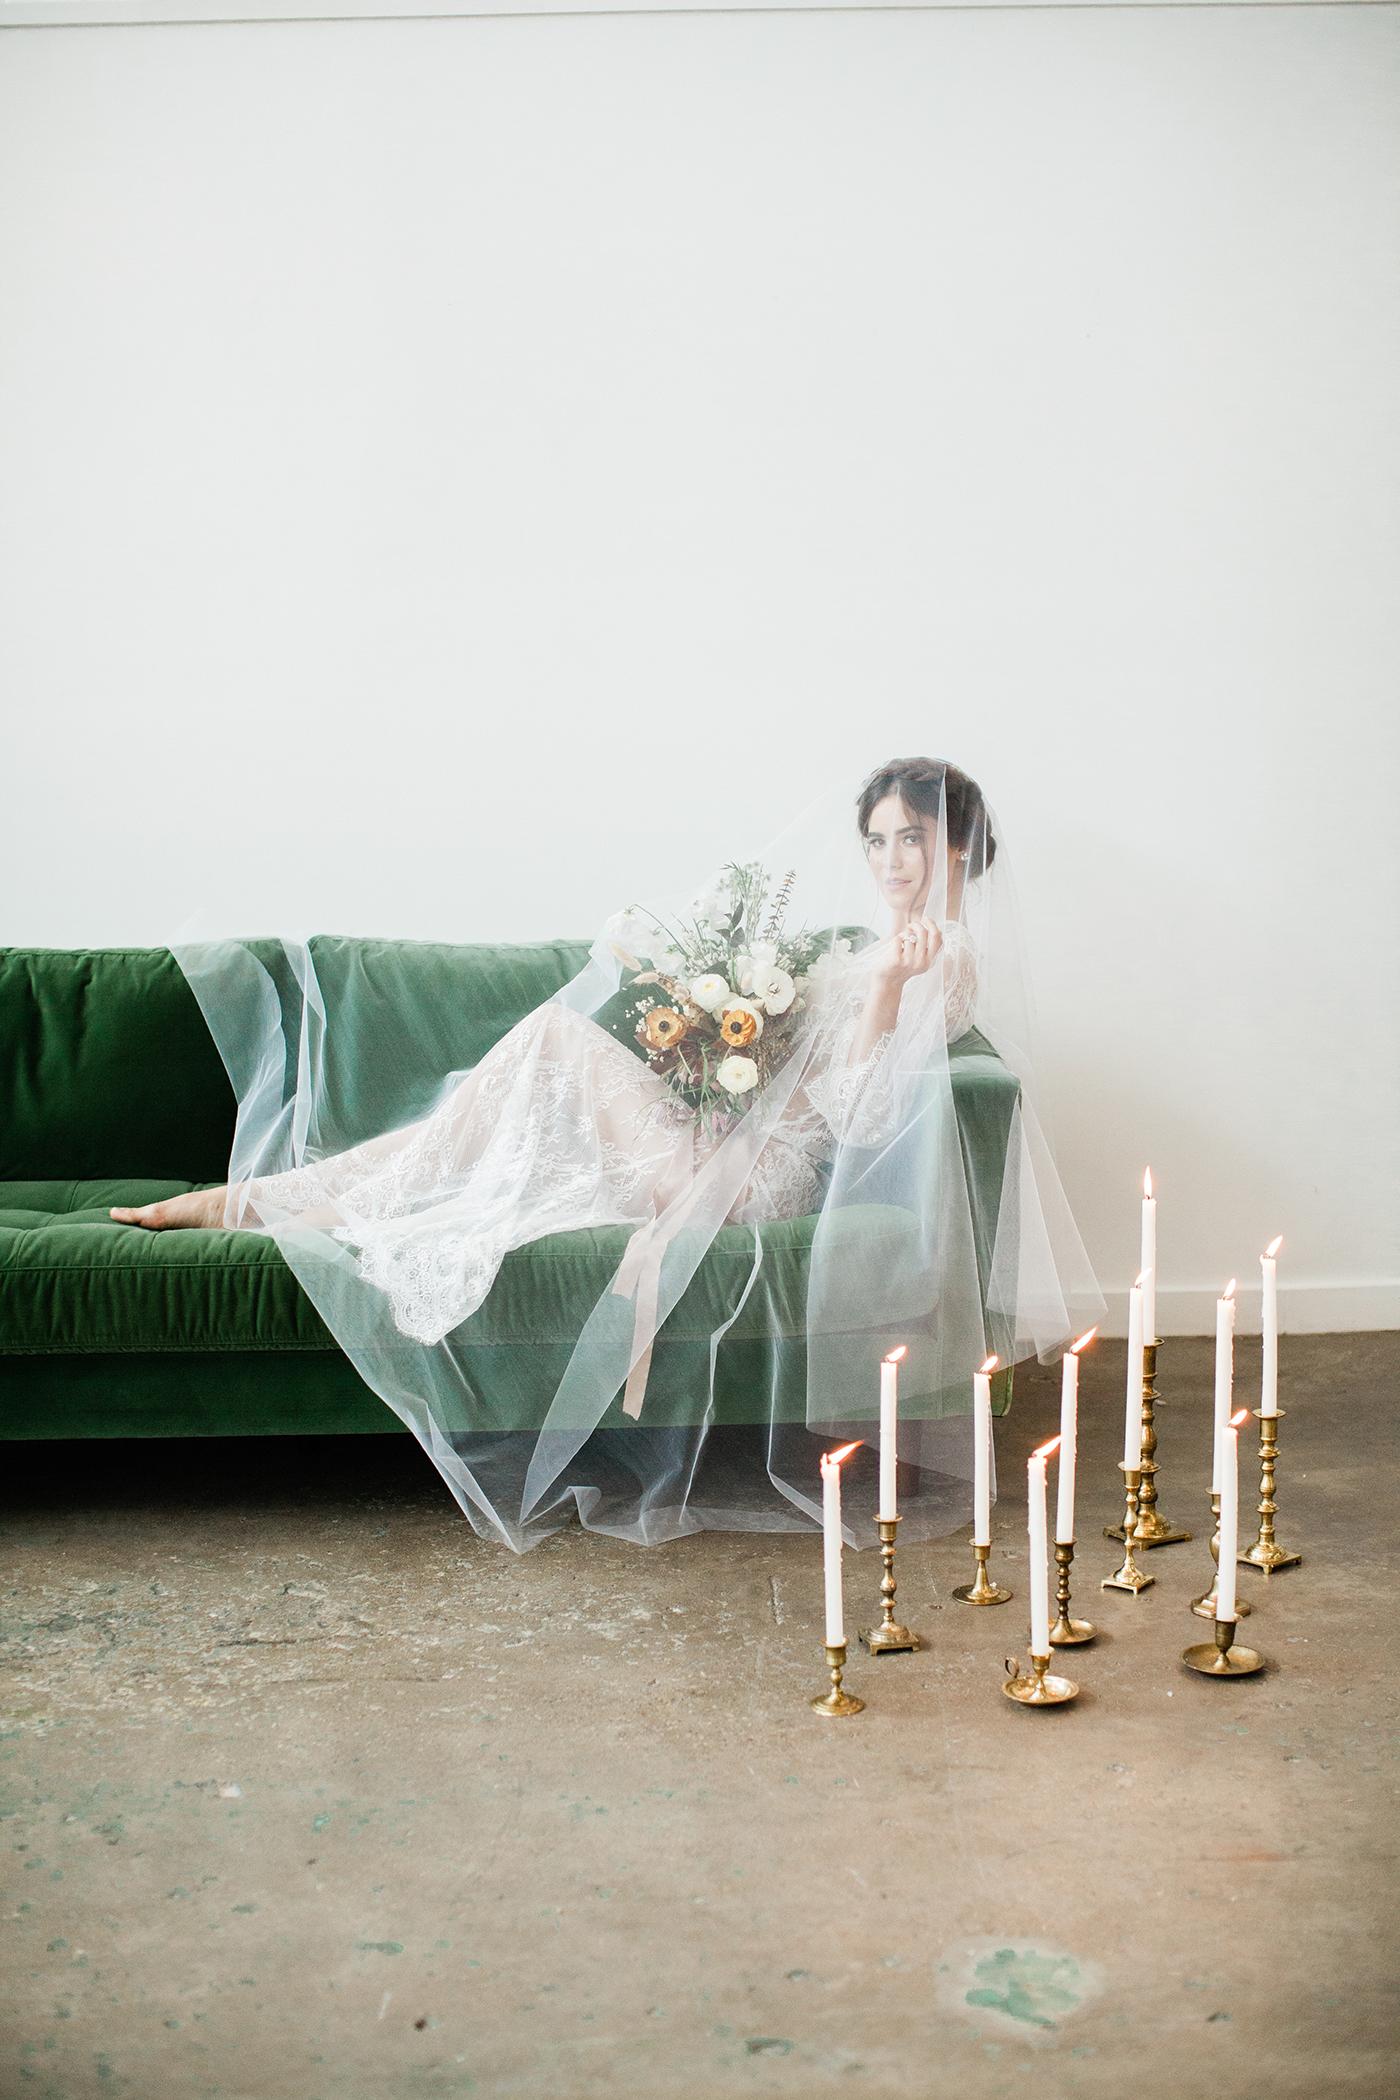 Wedding Floral Design Dallas - Olive Grove Design - Mimimalist Fall Wedding - 00137.jpg